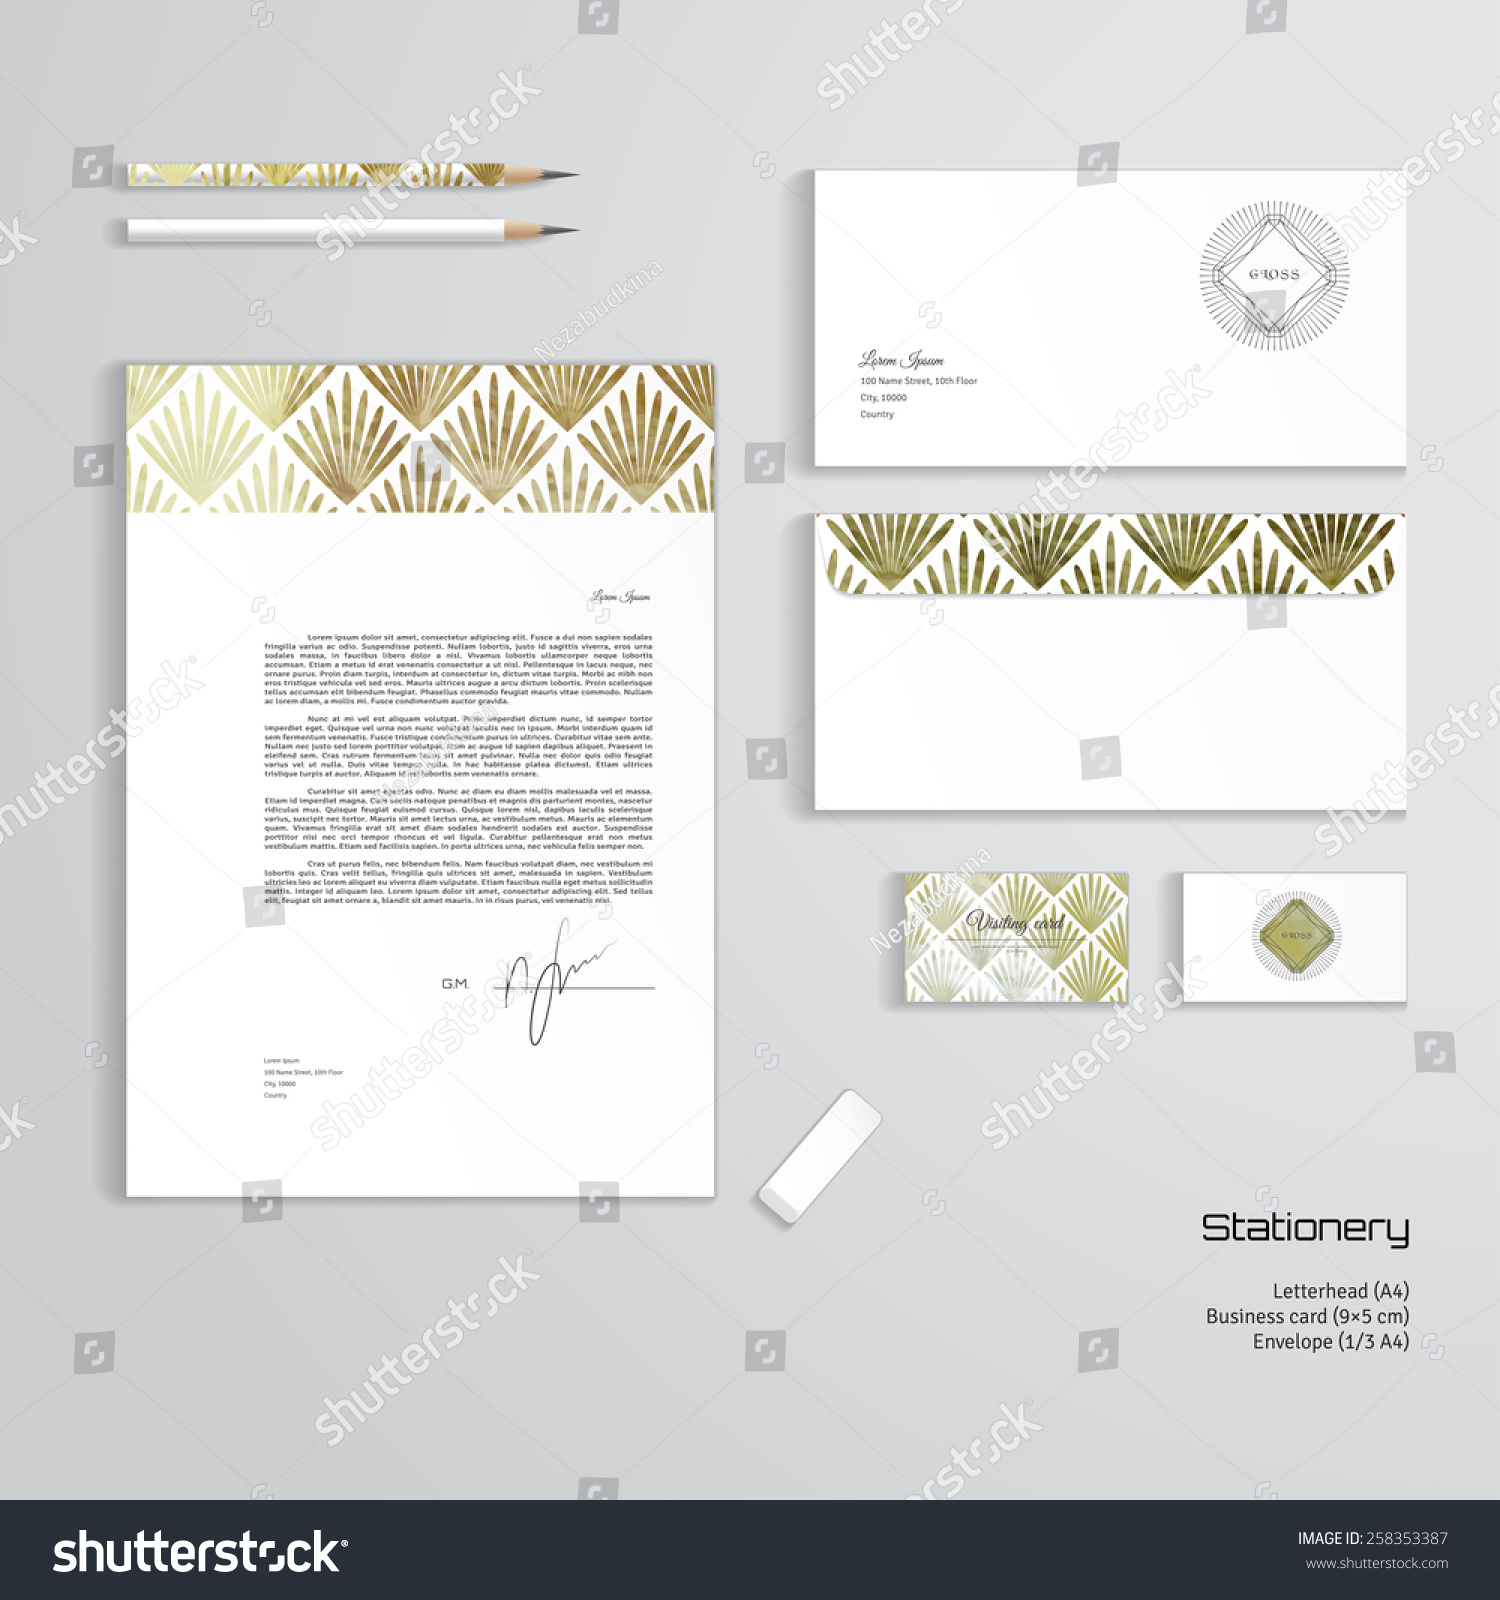 Vector corporate identity templates letterhead envelope stock vector vector corporate identity templates letterhead envelope business card pencils eraser wajeb Images